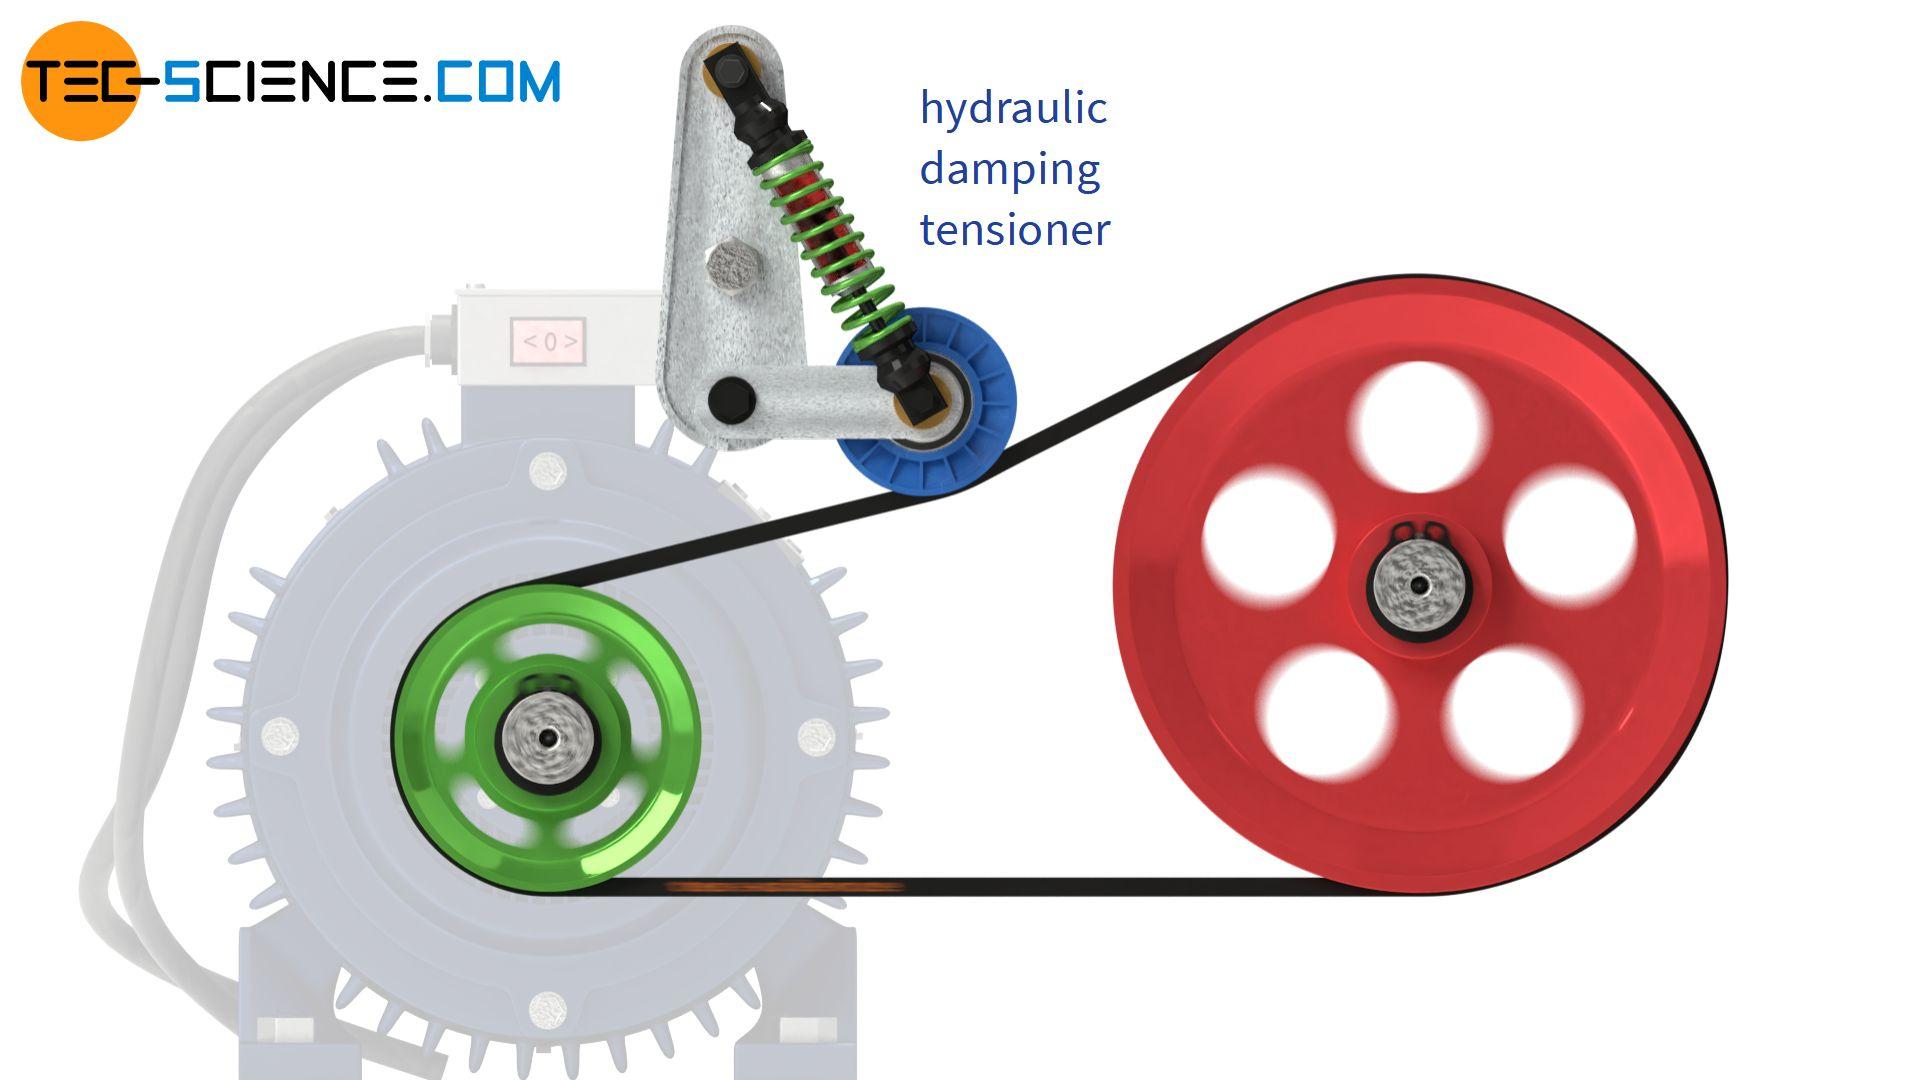 Hydraulic damping tensioner